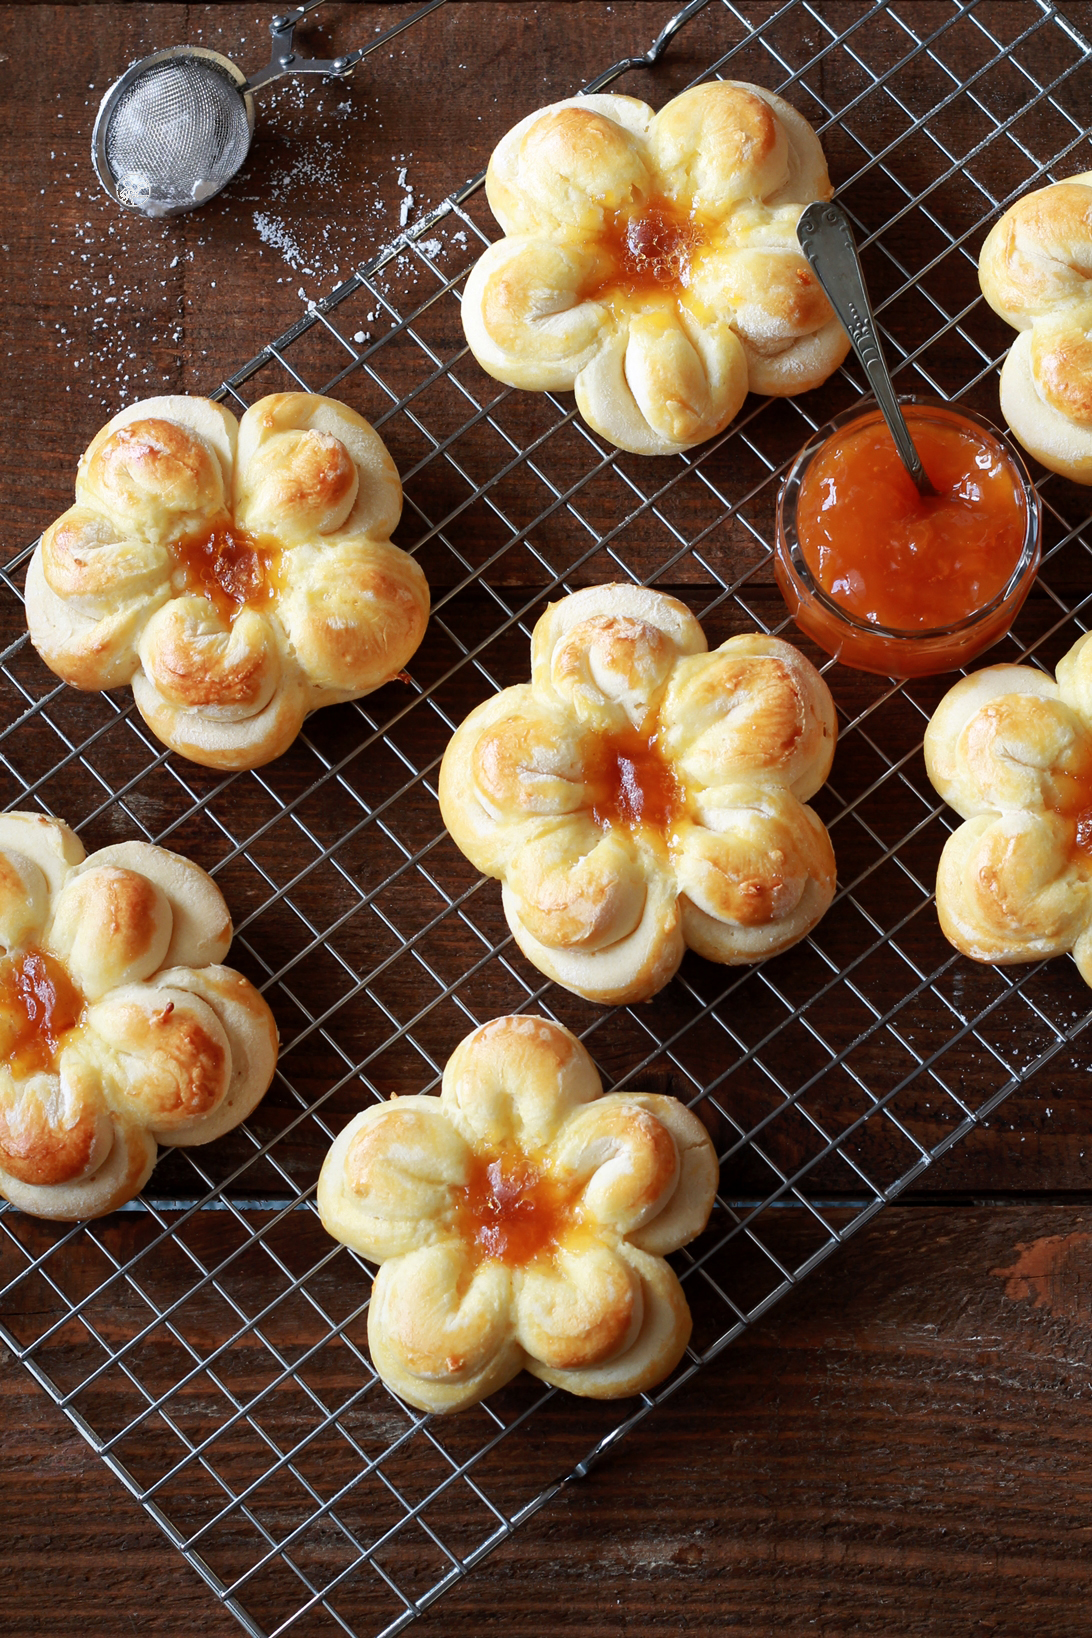 Petites brioches fleurs sans gluten - La Cassata Celiaca